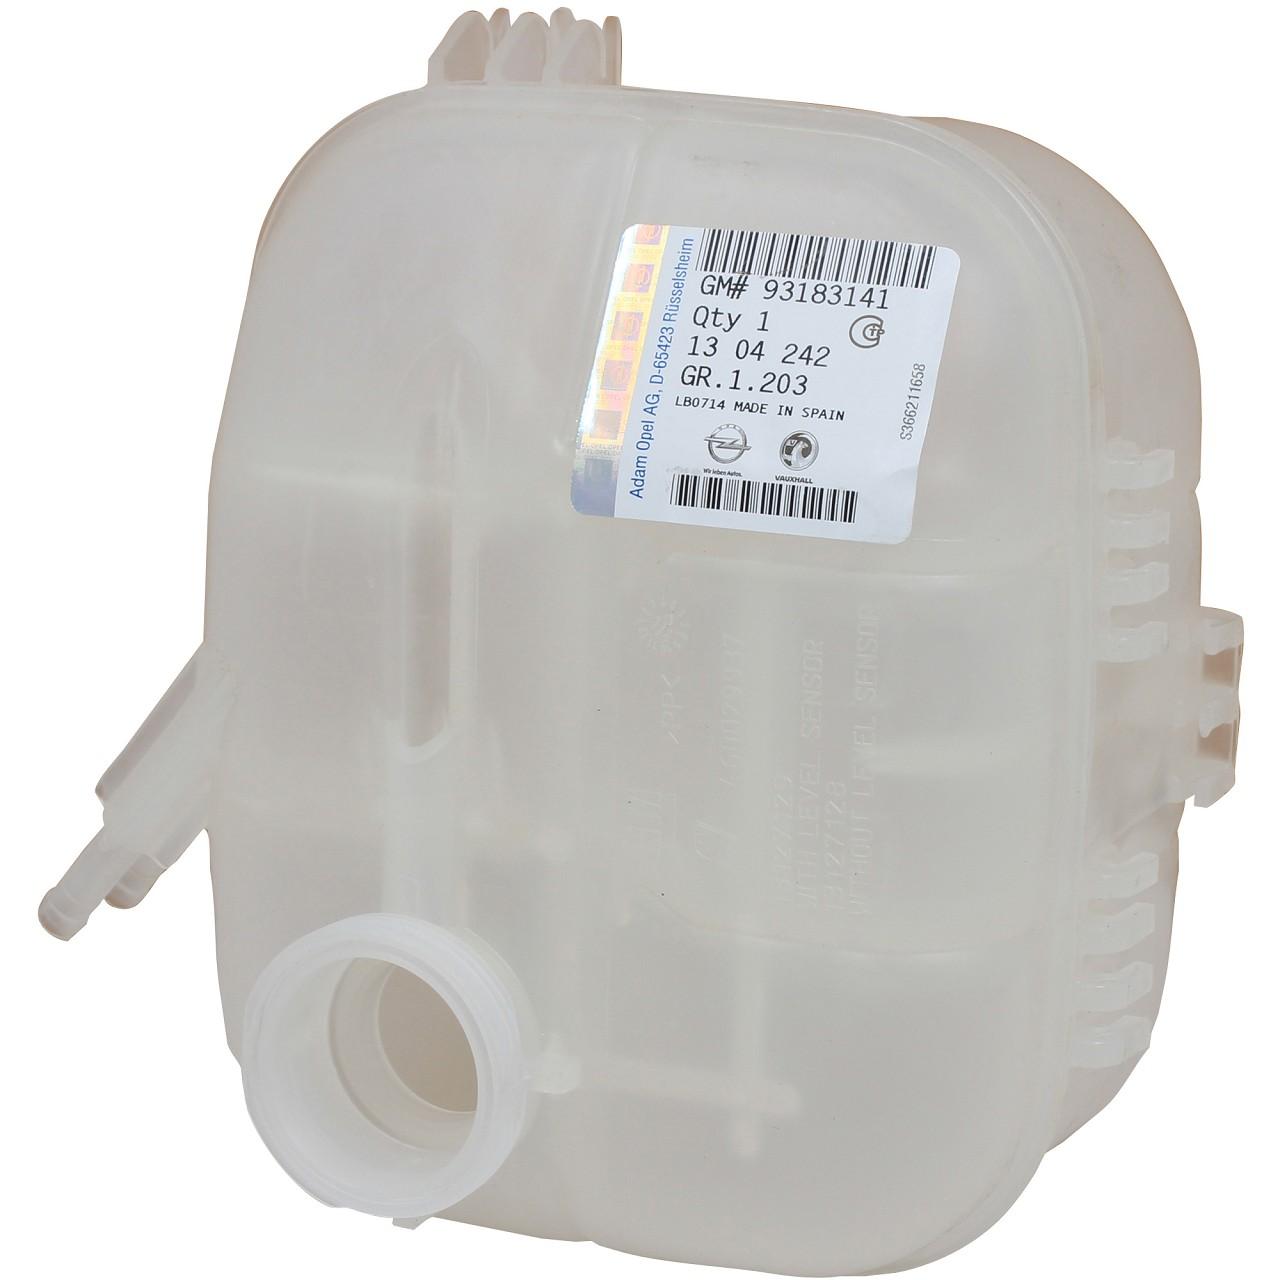 ORIGINAL GM Opel Ausgleichsbehälter Kühlmittelbehälter ZAFIRA B 1304242